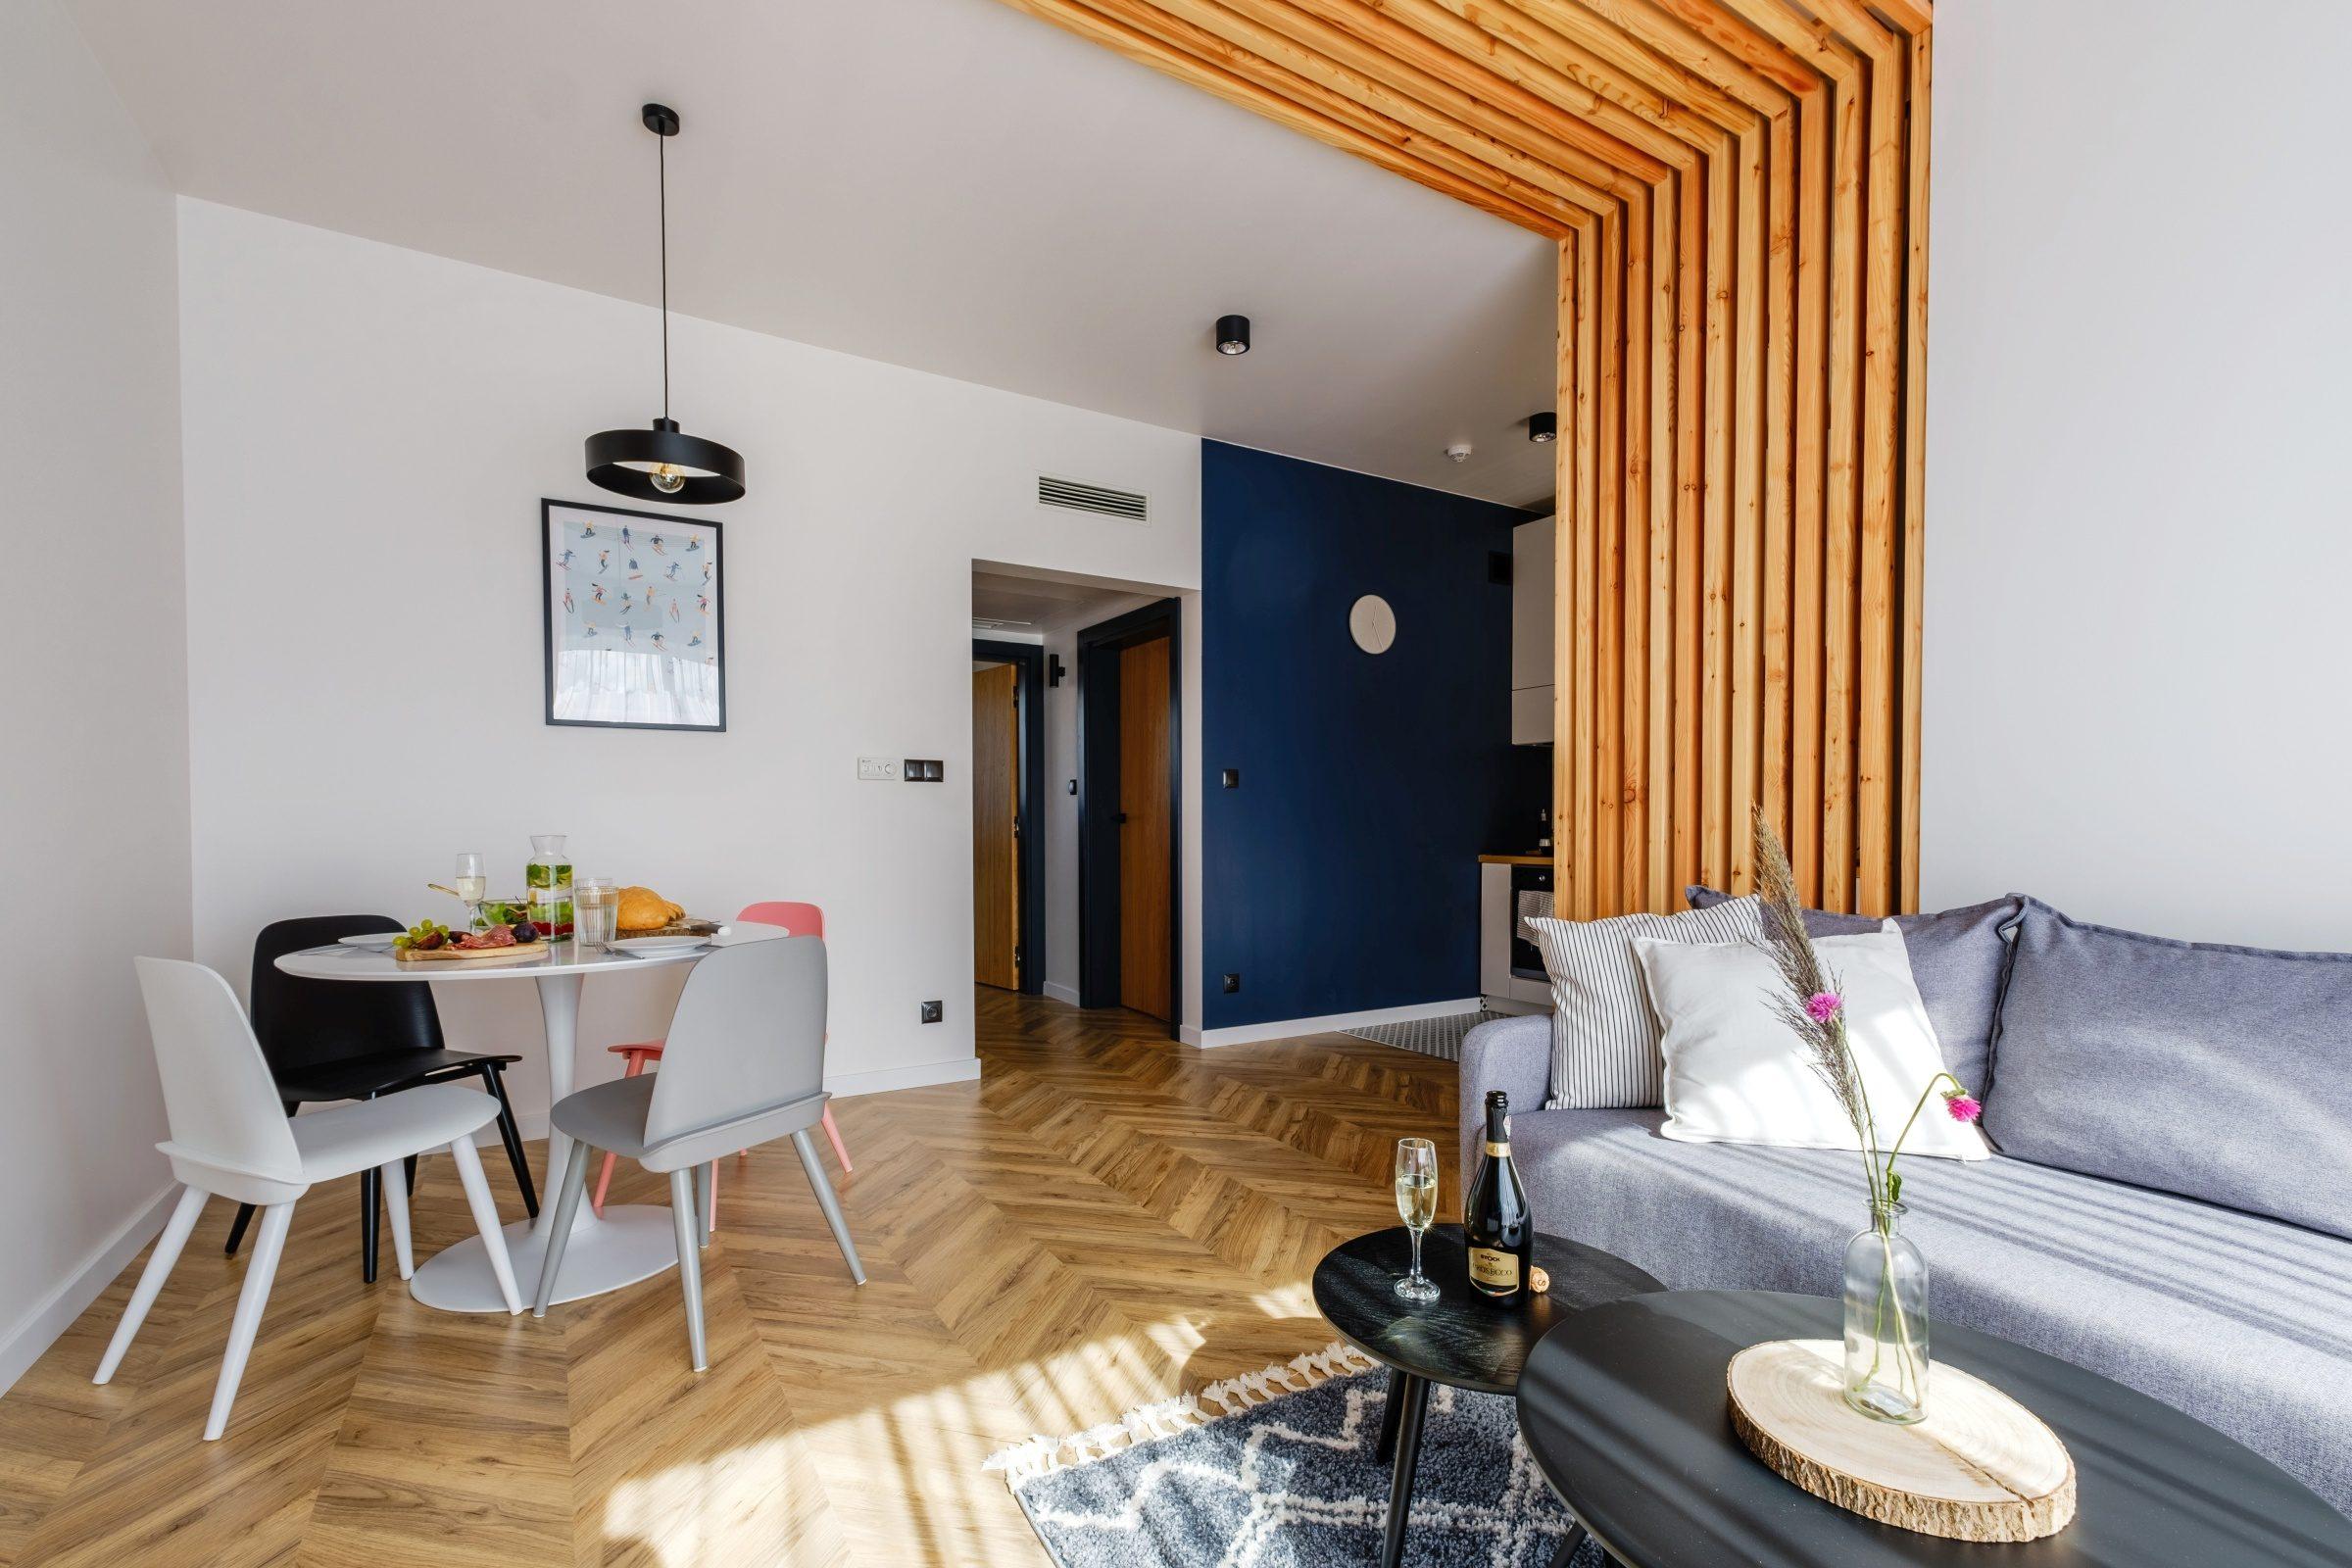 Apartamenty NOVA BIAŁKA Białka Tatrzańska apartament 6 salon 2